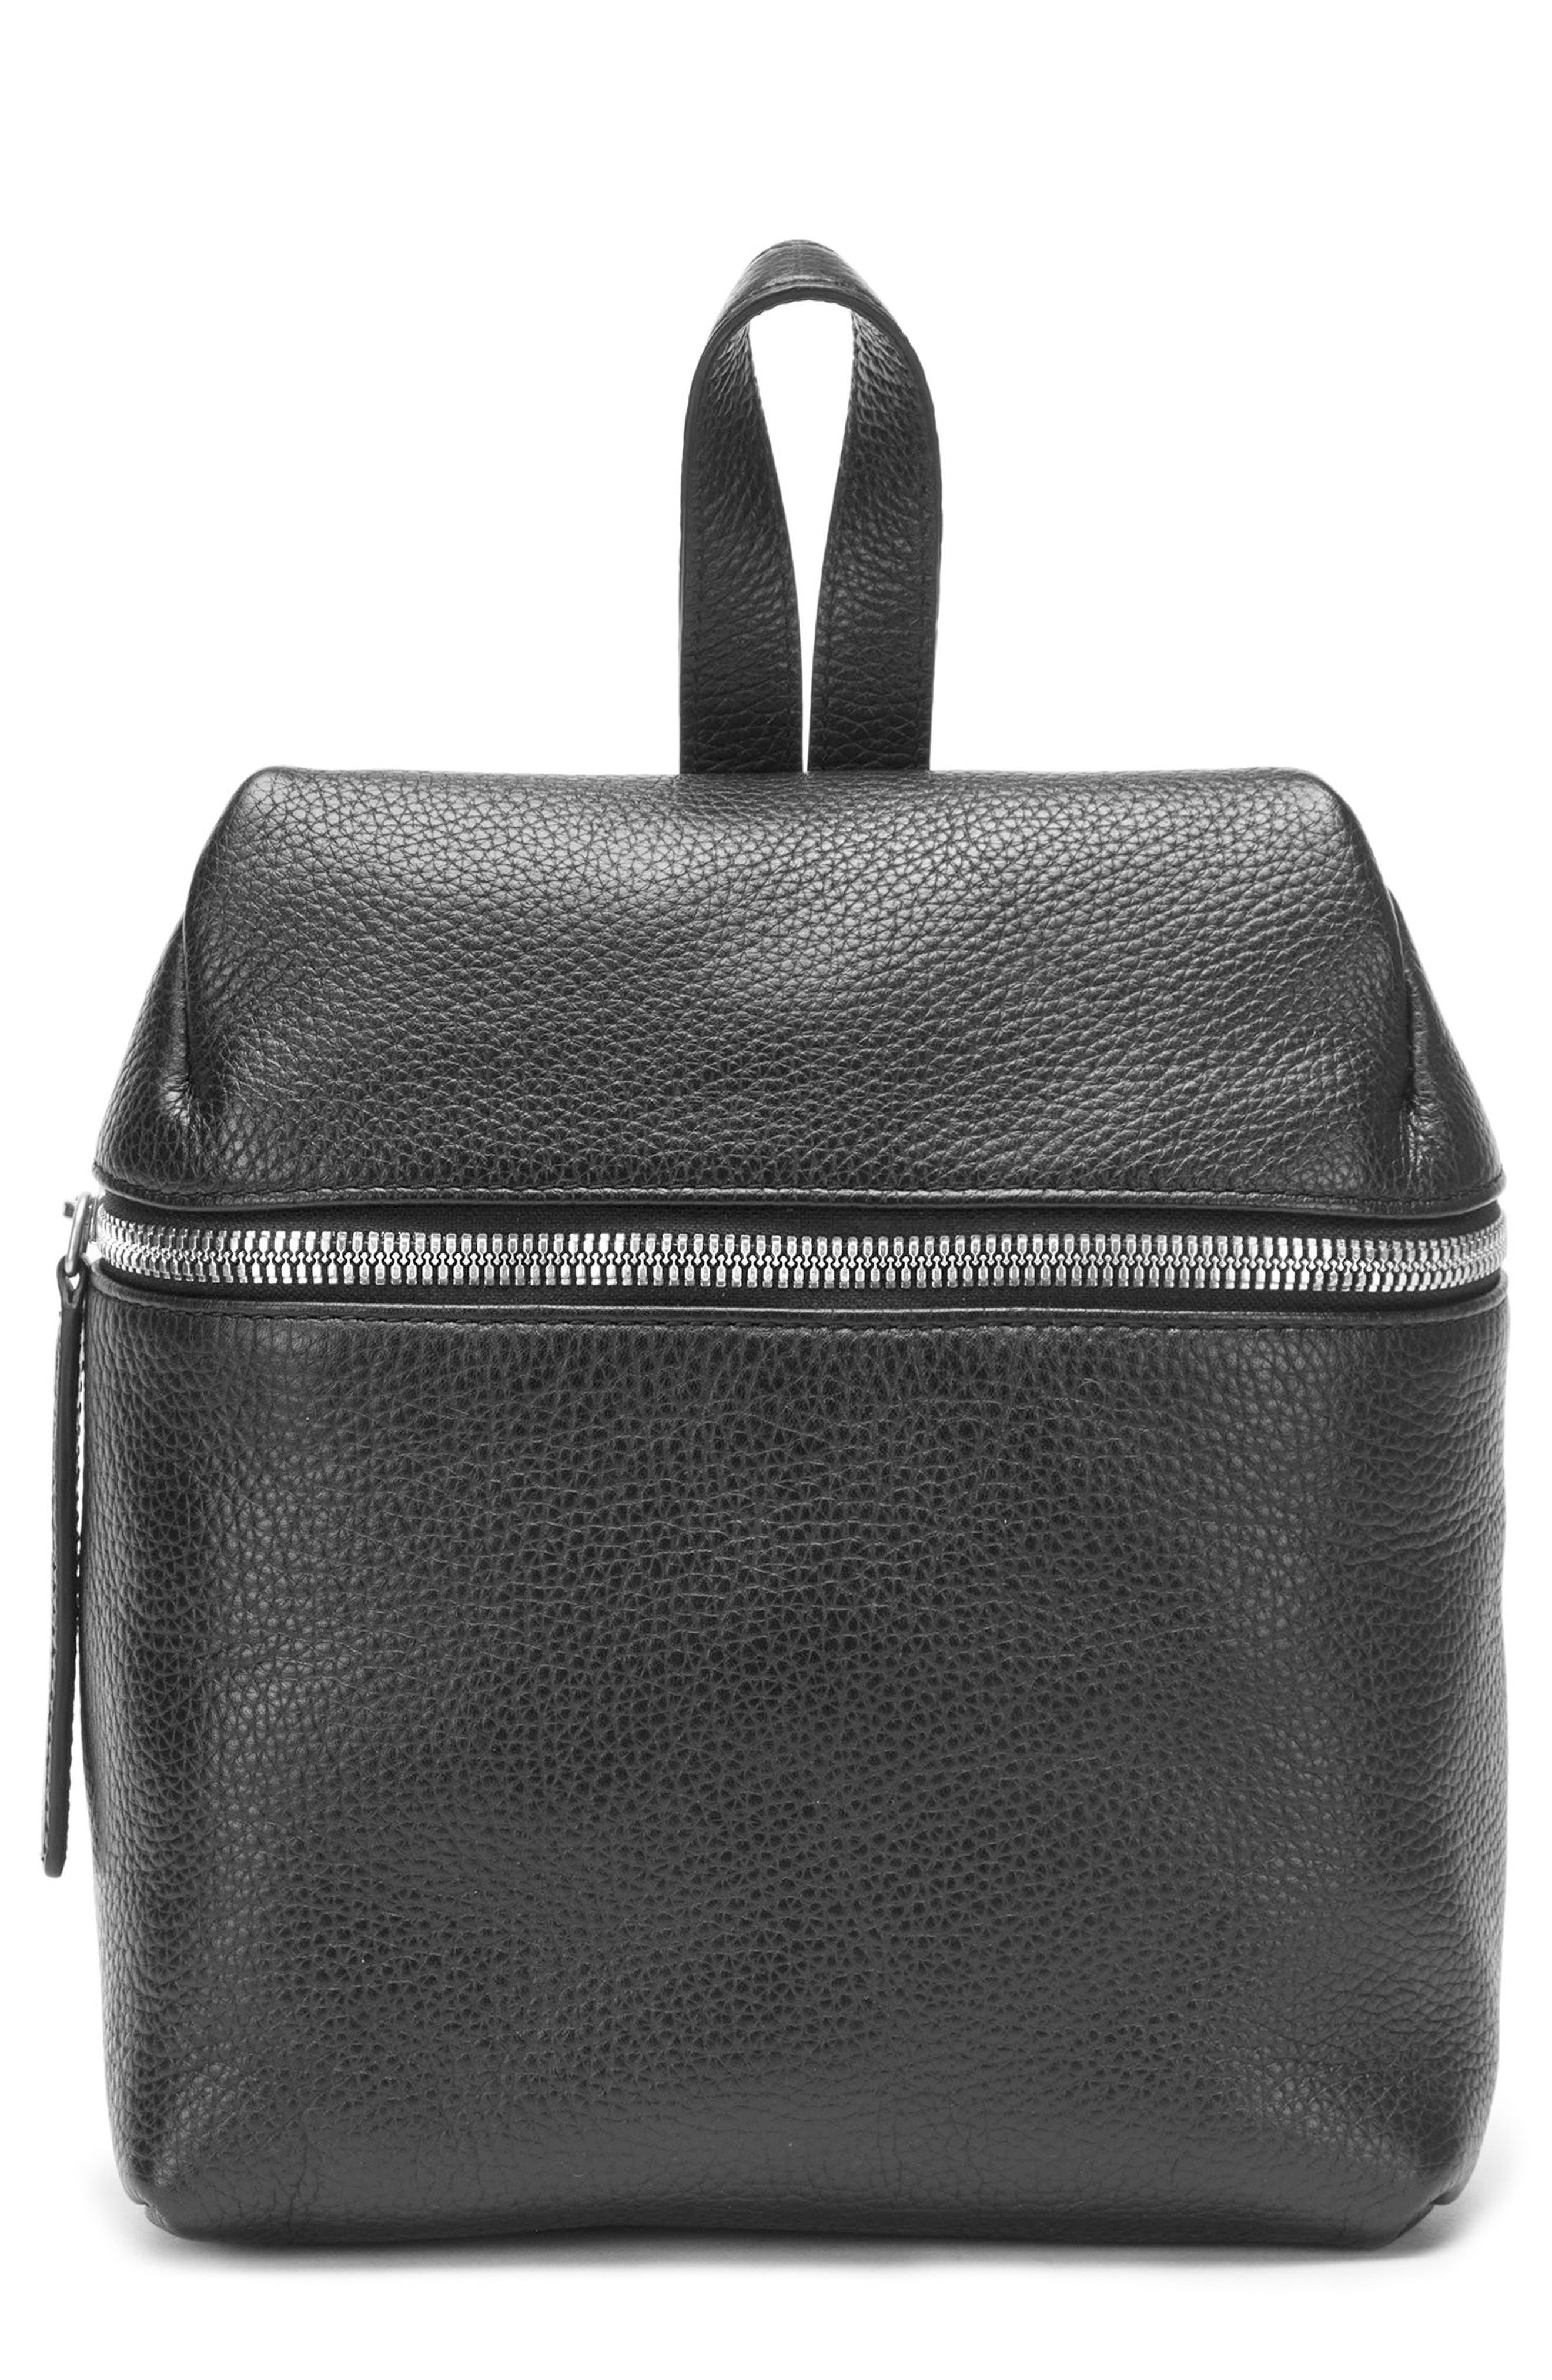 Main Image - KARA Small Pebbled Leather Backpack